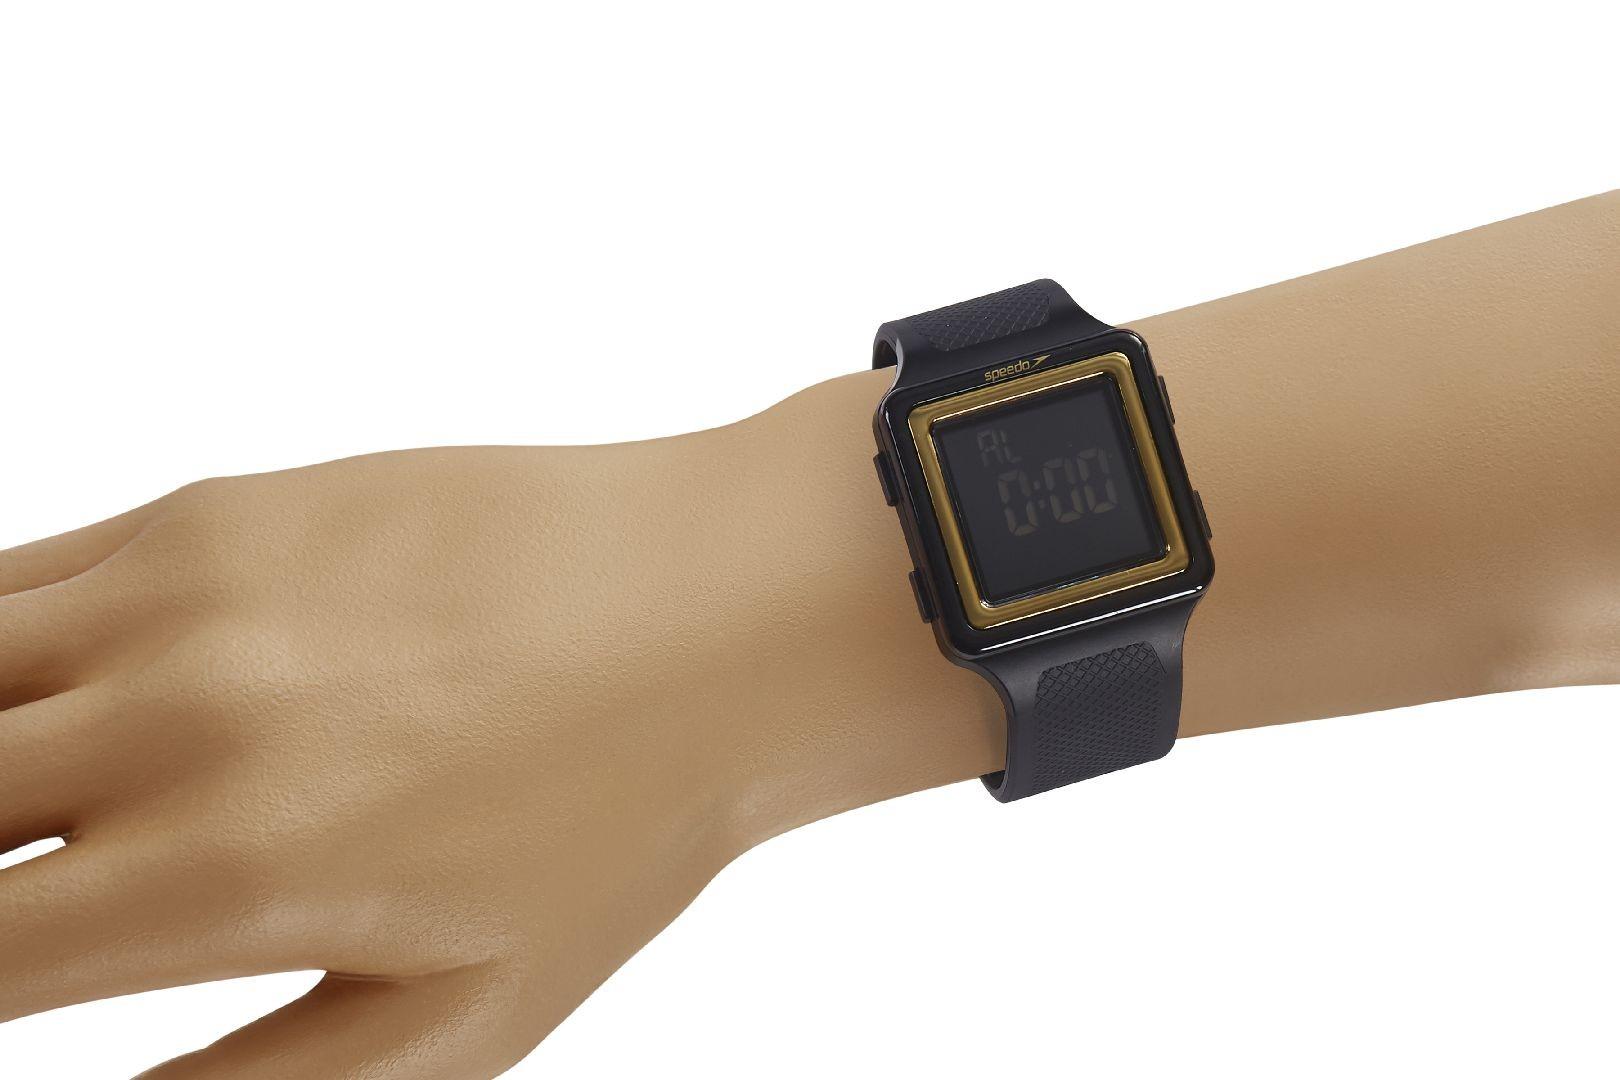 Relógio Masculino Speedo Pulseira de Poliuretano Preta Fundo LCD Negativo 80650G0EVNP1